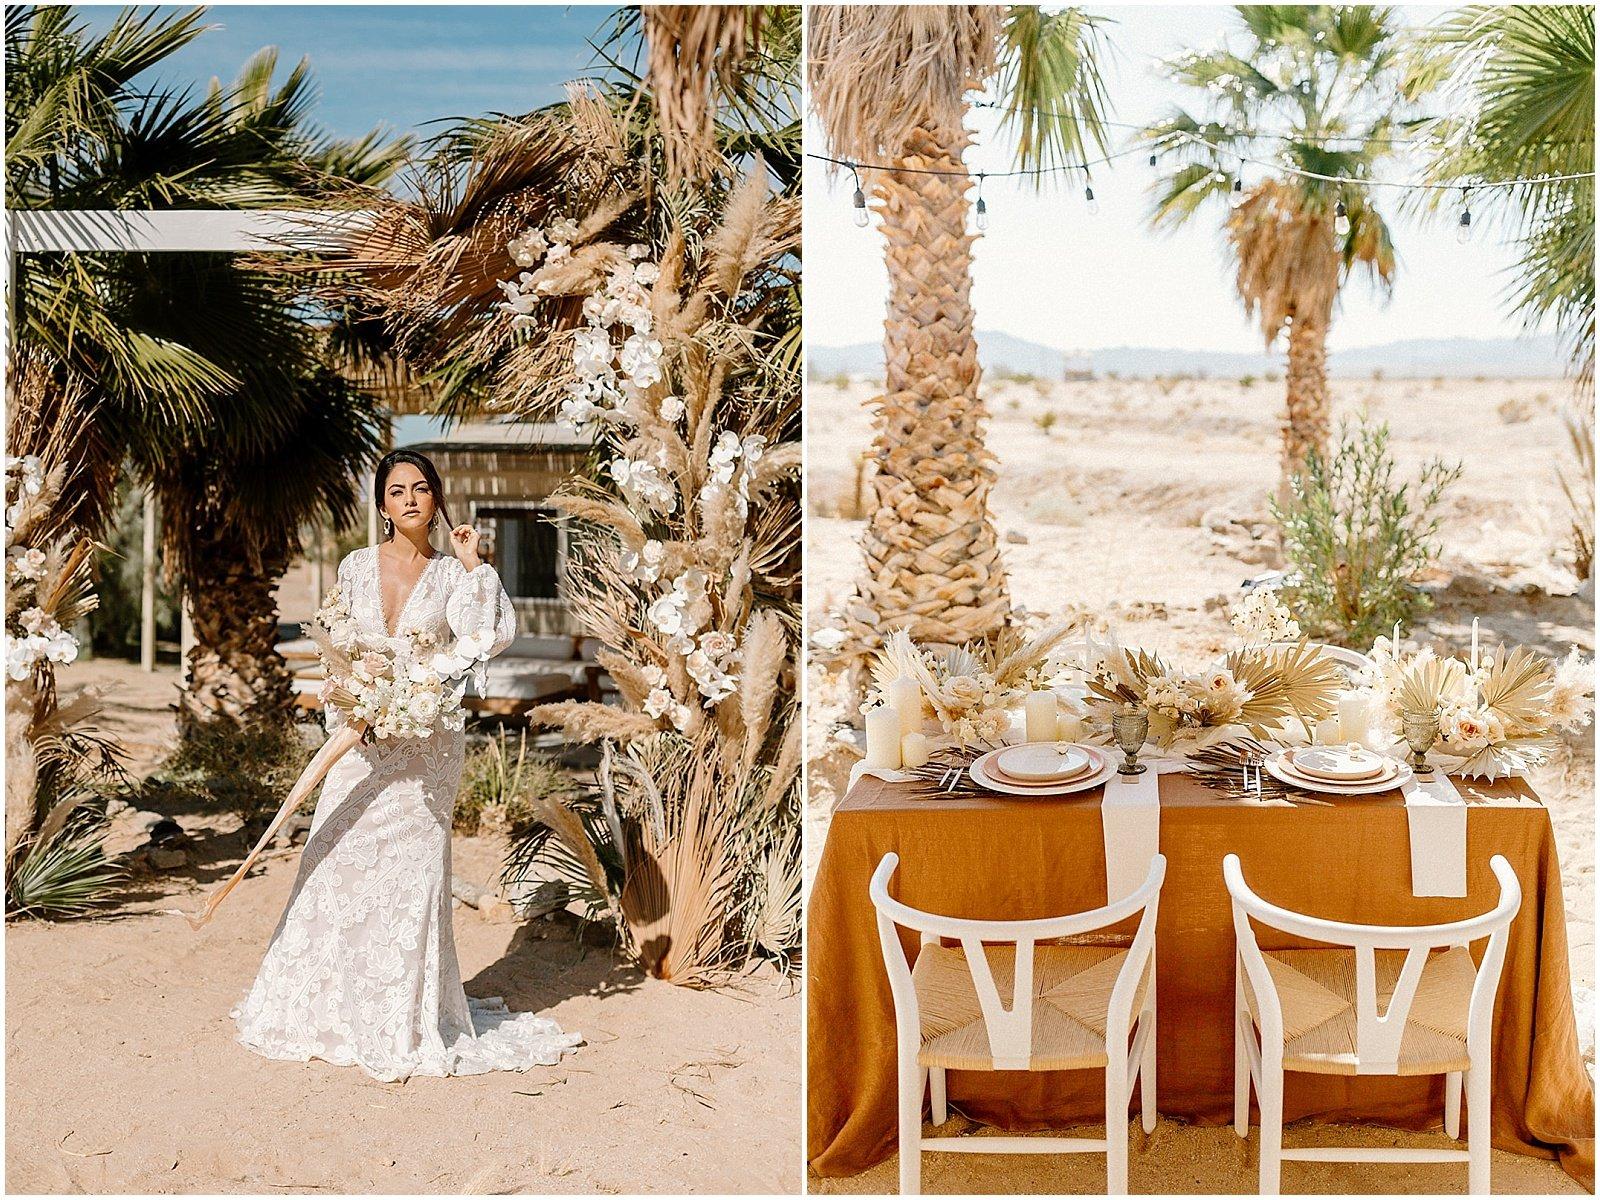 wedding reception set up in Joshua Tree, California